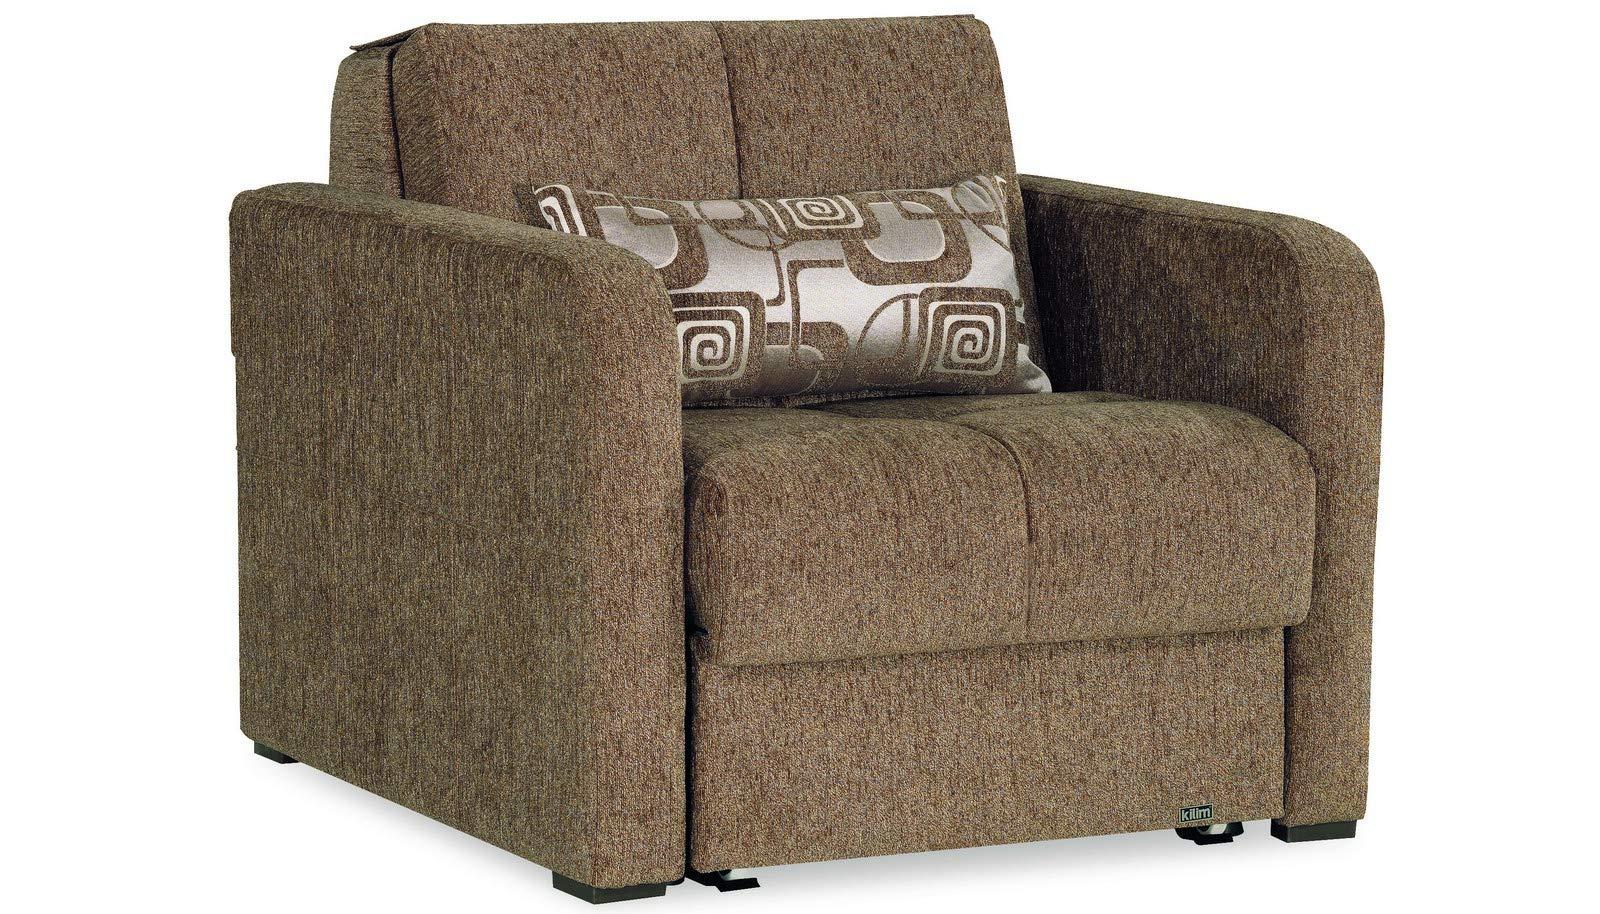 Casamode Ferra Fashion Chair Sleeper Brown Fabric Chennile